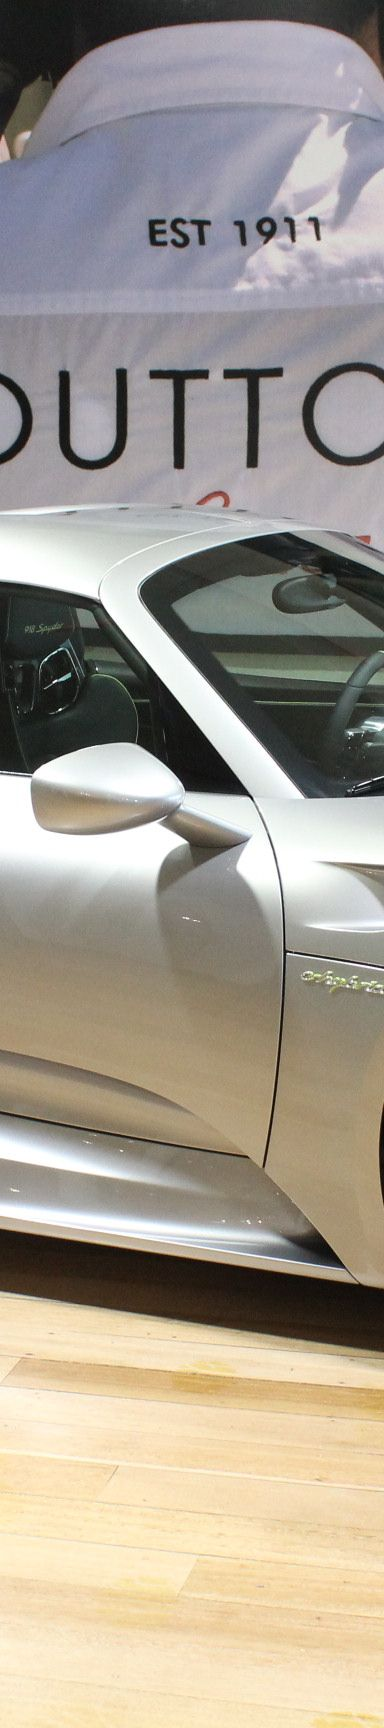 2015 Porsche 918 Spyder - Unique and rare cars sold at Dutton Garage, Australia's premier prestige, luxury and classic car dealer.